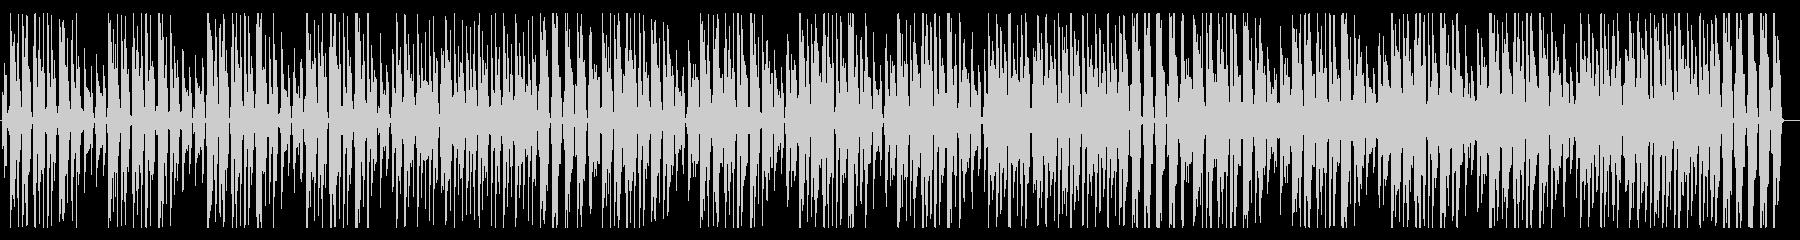 YouTube ピアノ・コミカル・軽快の未再生の波形